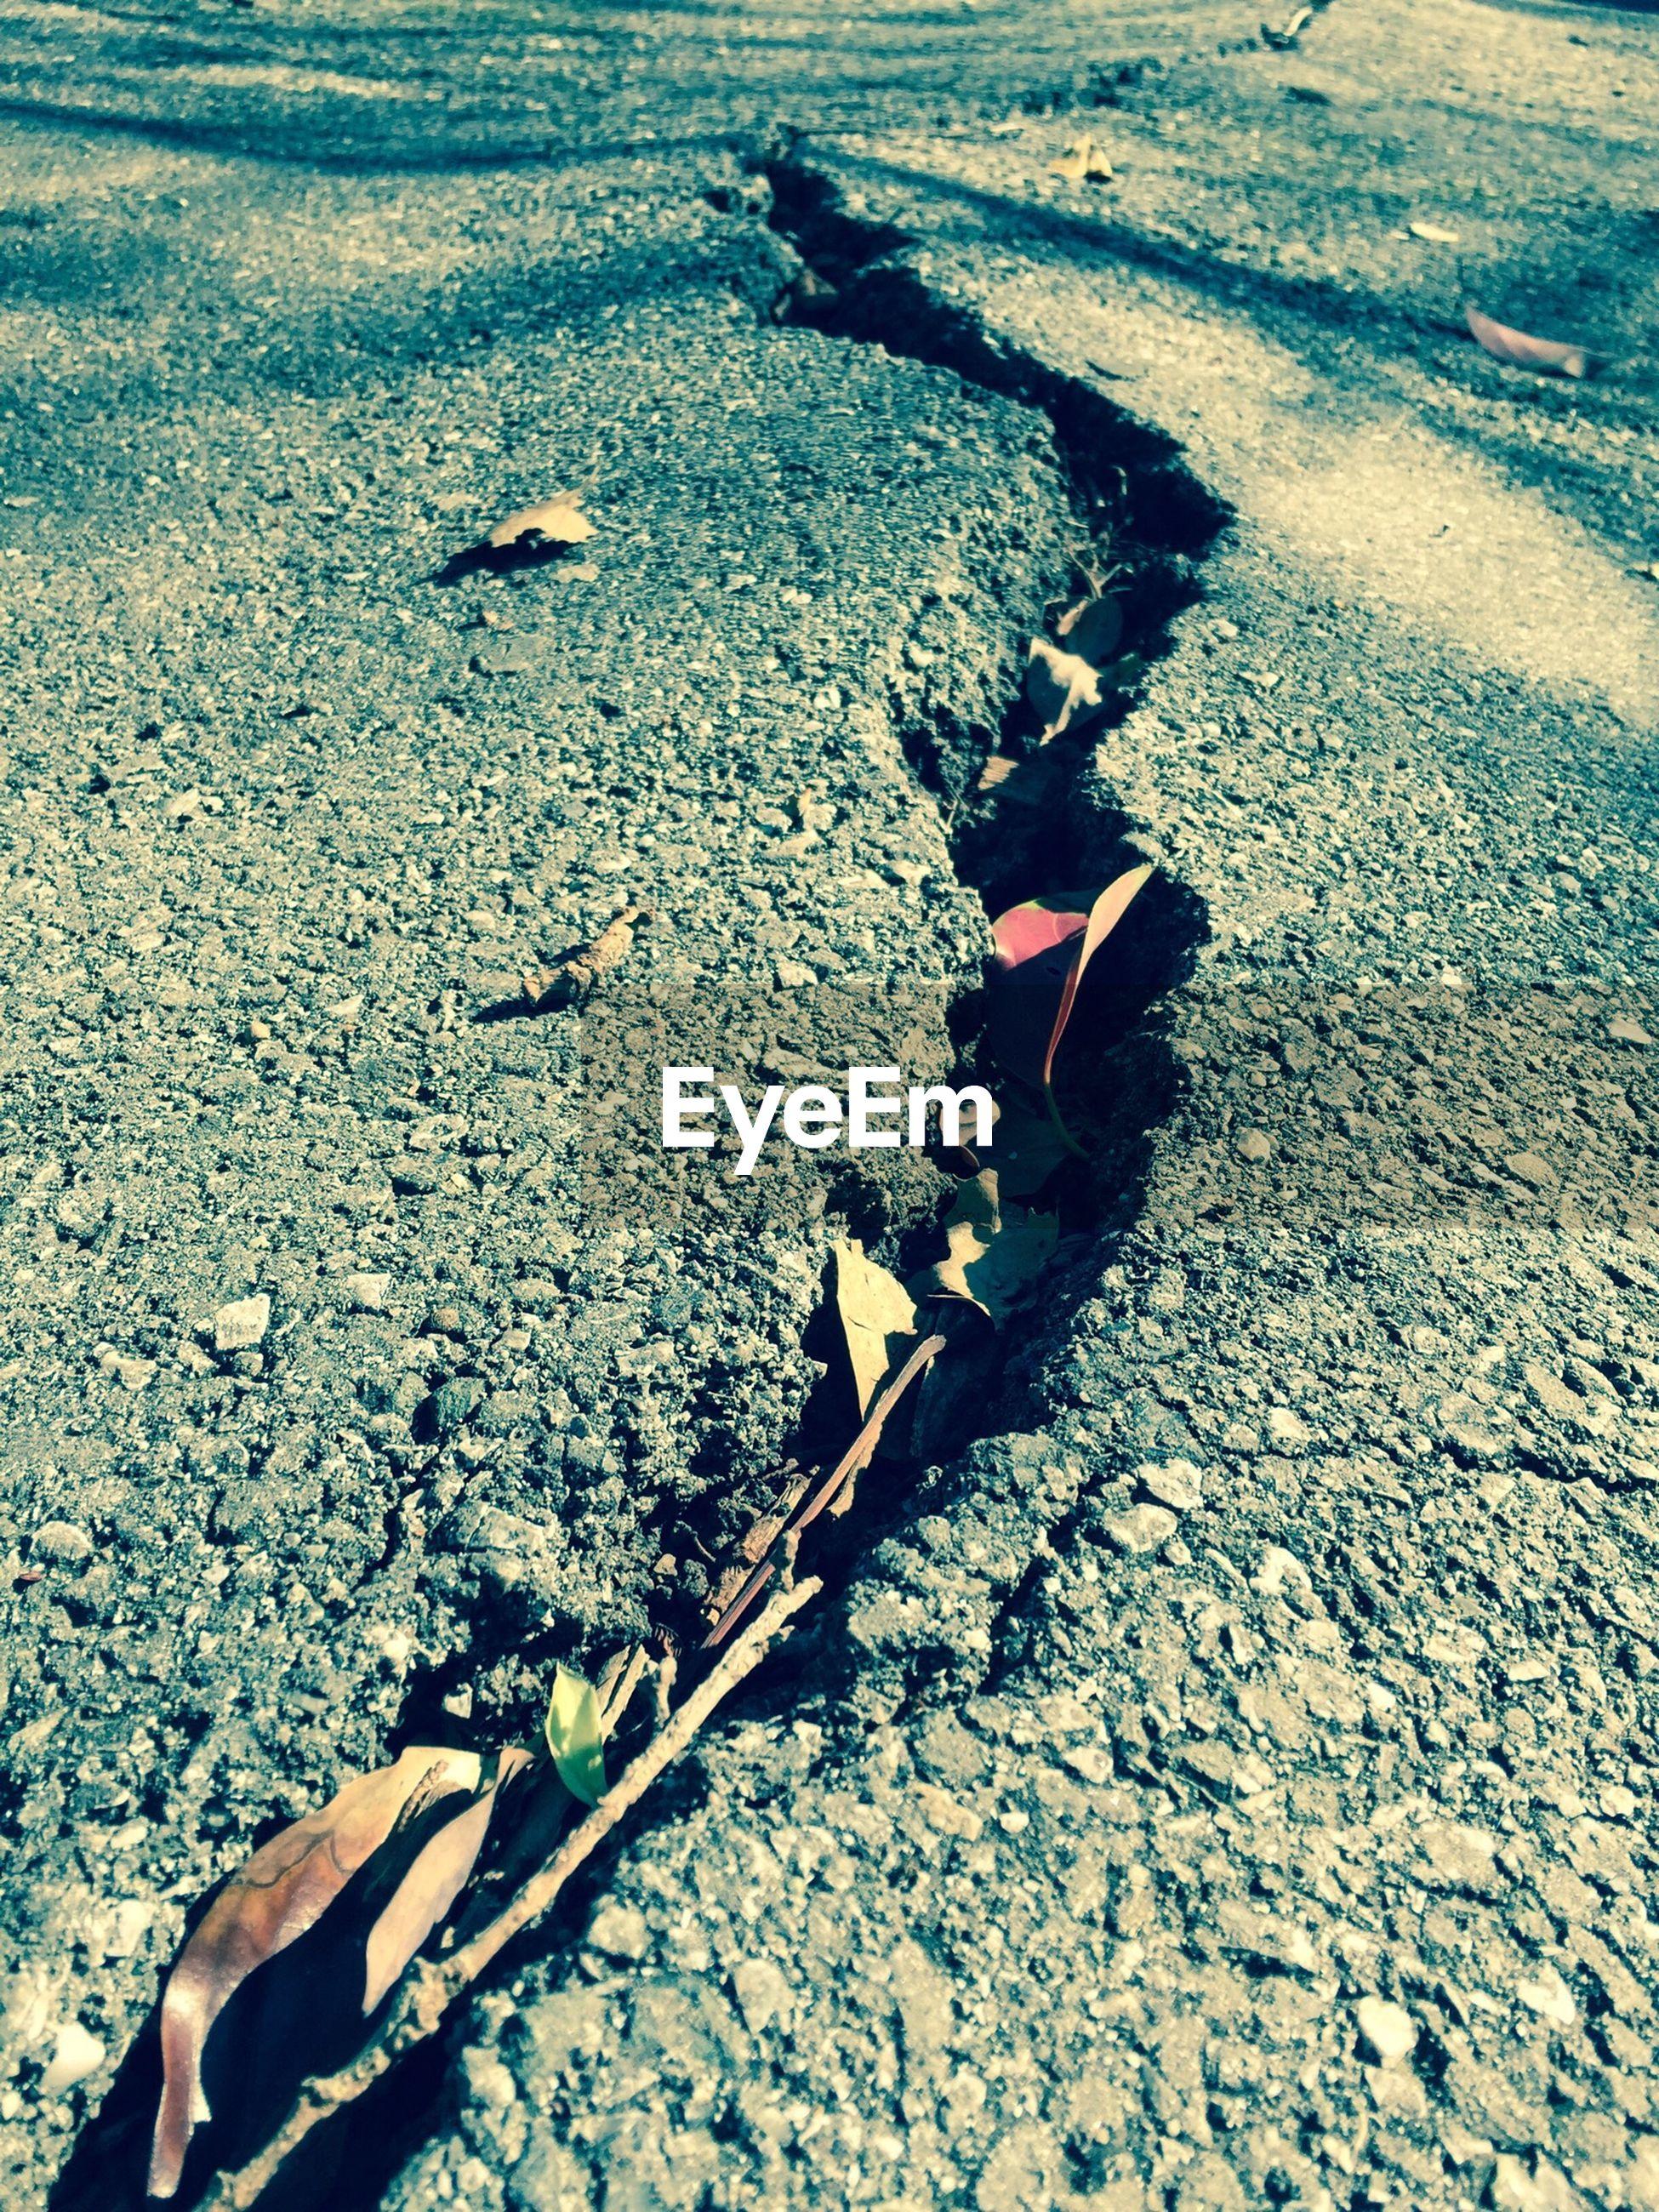 Detail shot of cracked ground